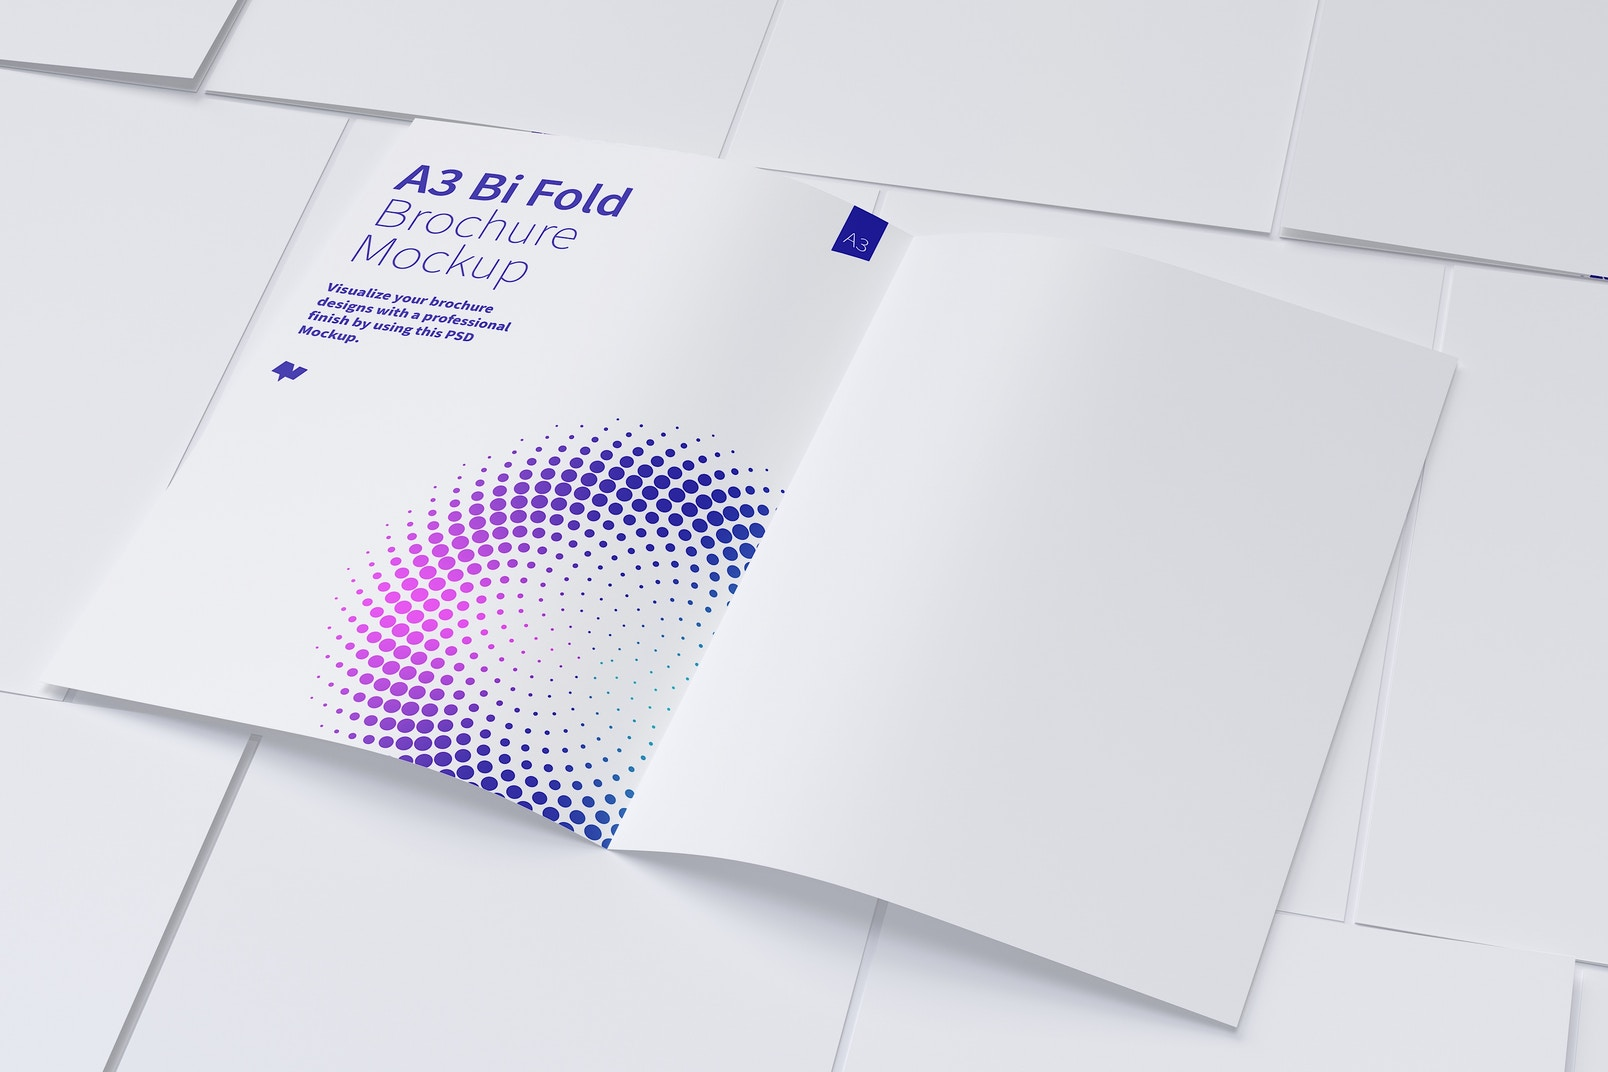 A3 Bi Fold Brochure Mockup 06